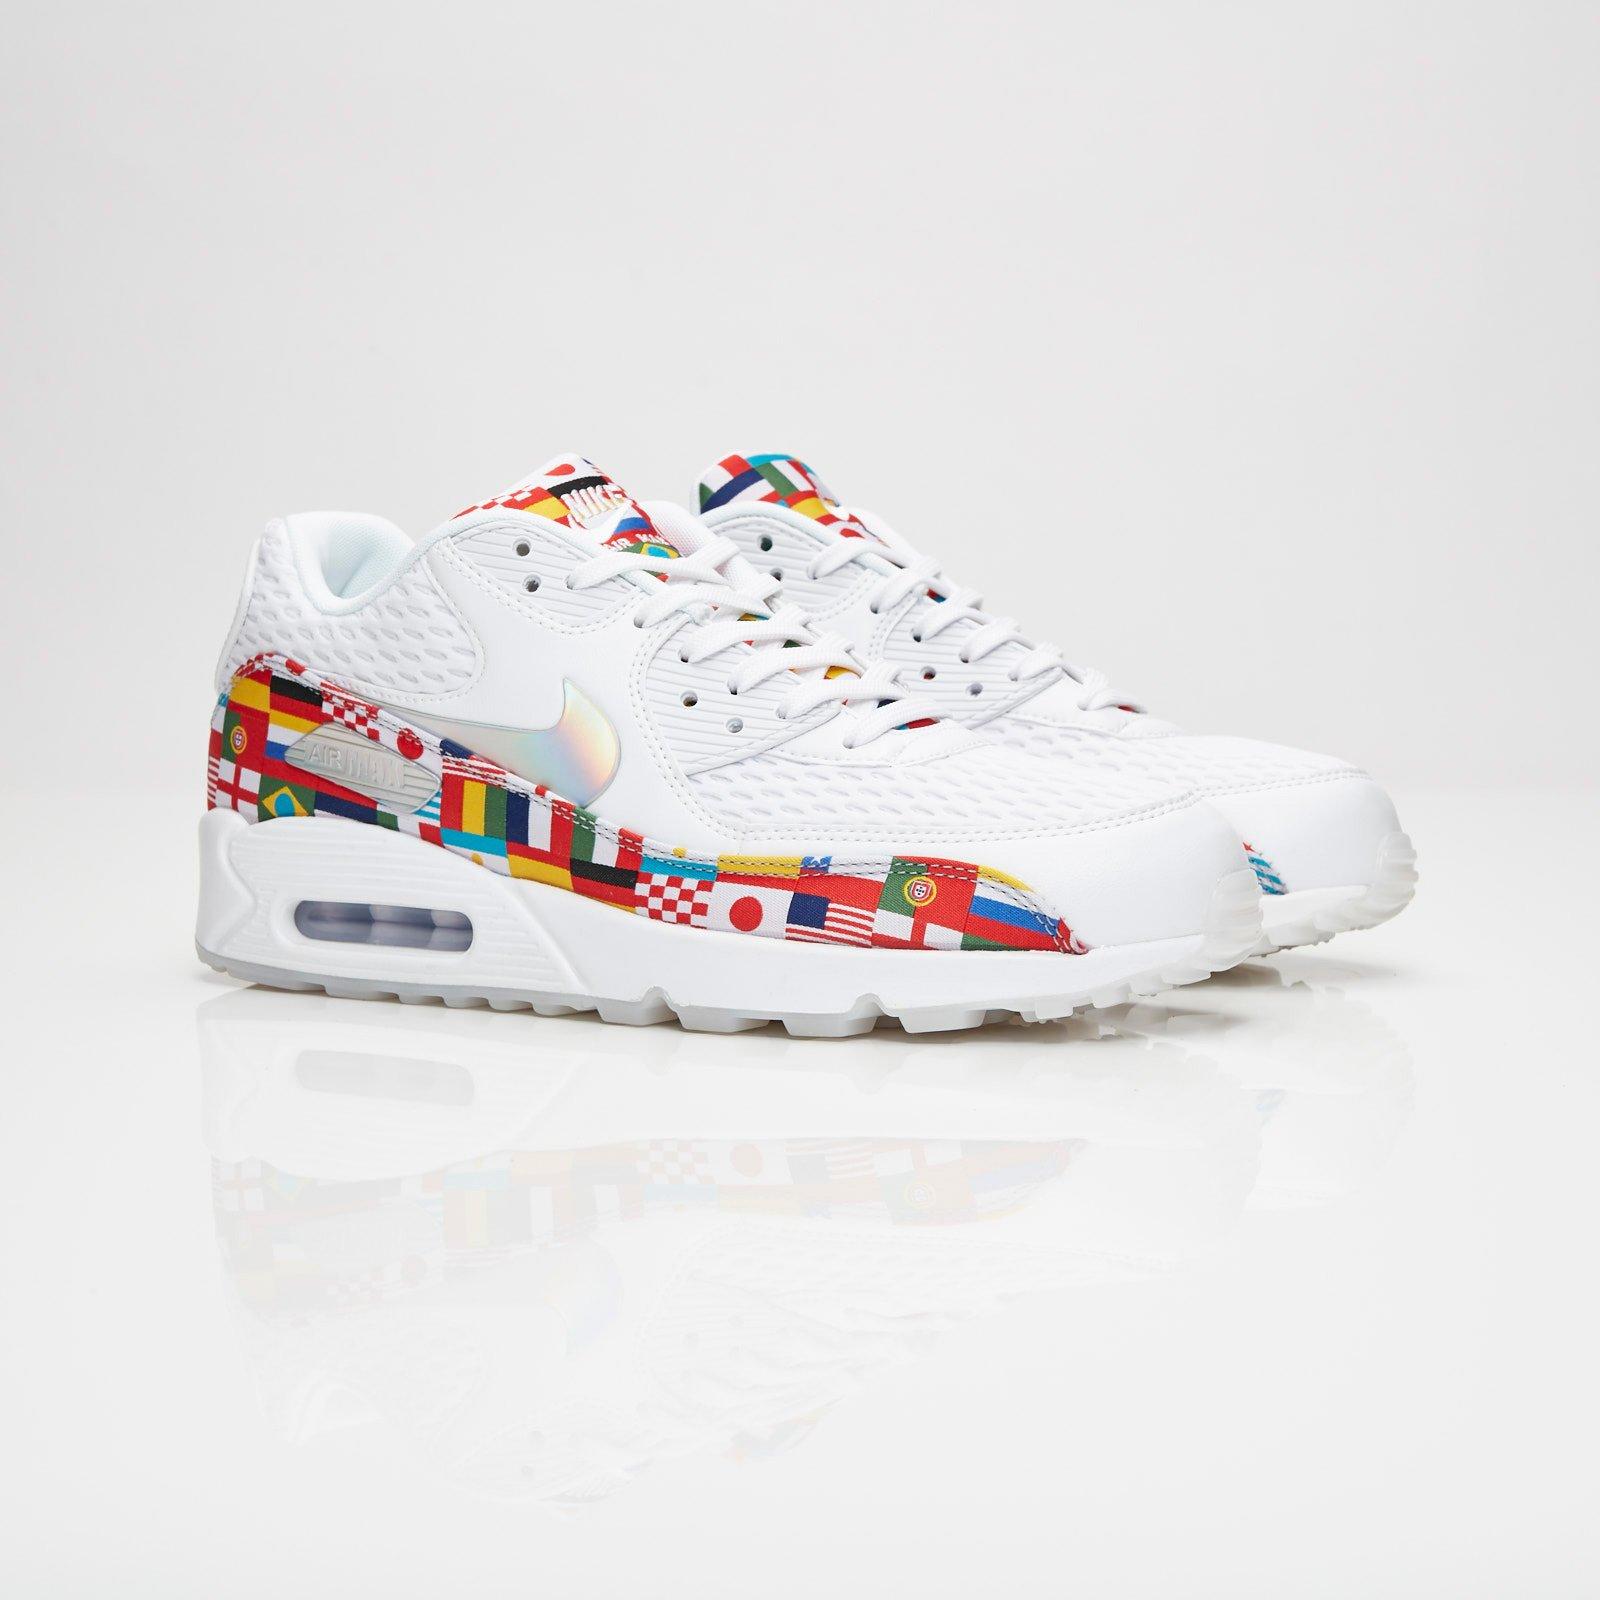 Nike Air Max 90 NIC QS Ao5119 100 Sneakersnstuff